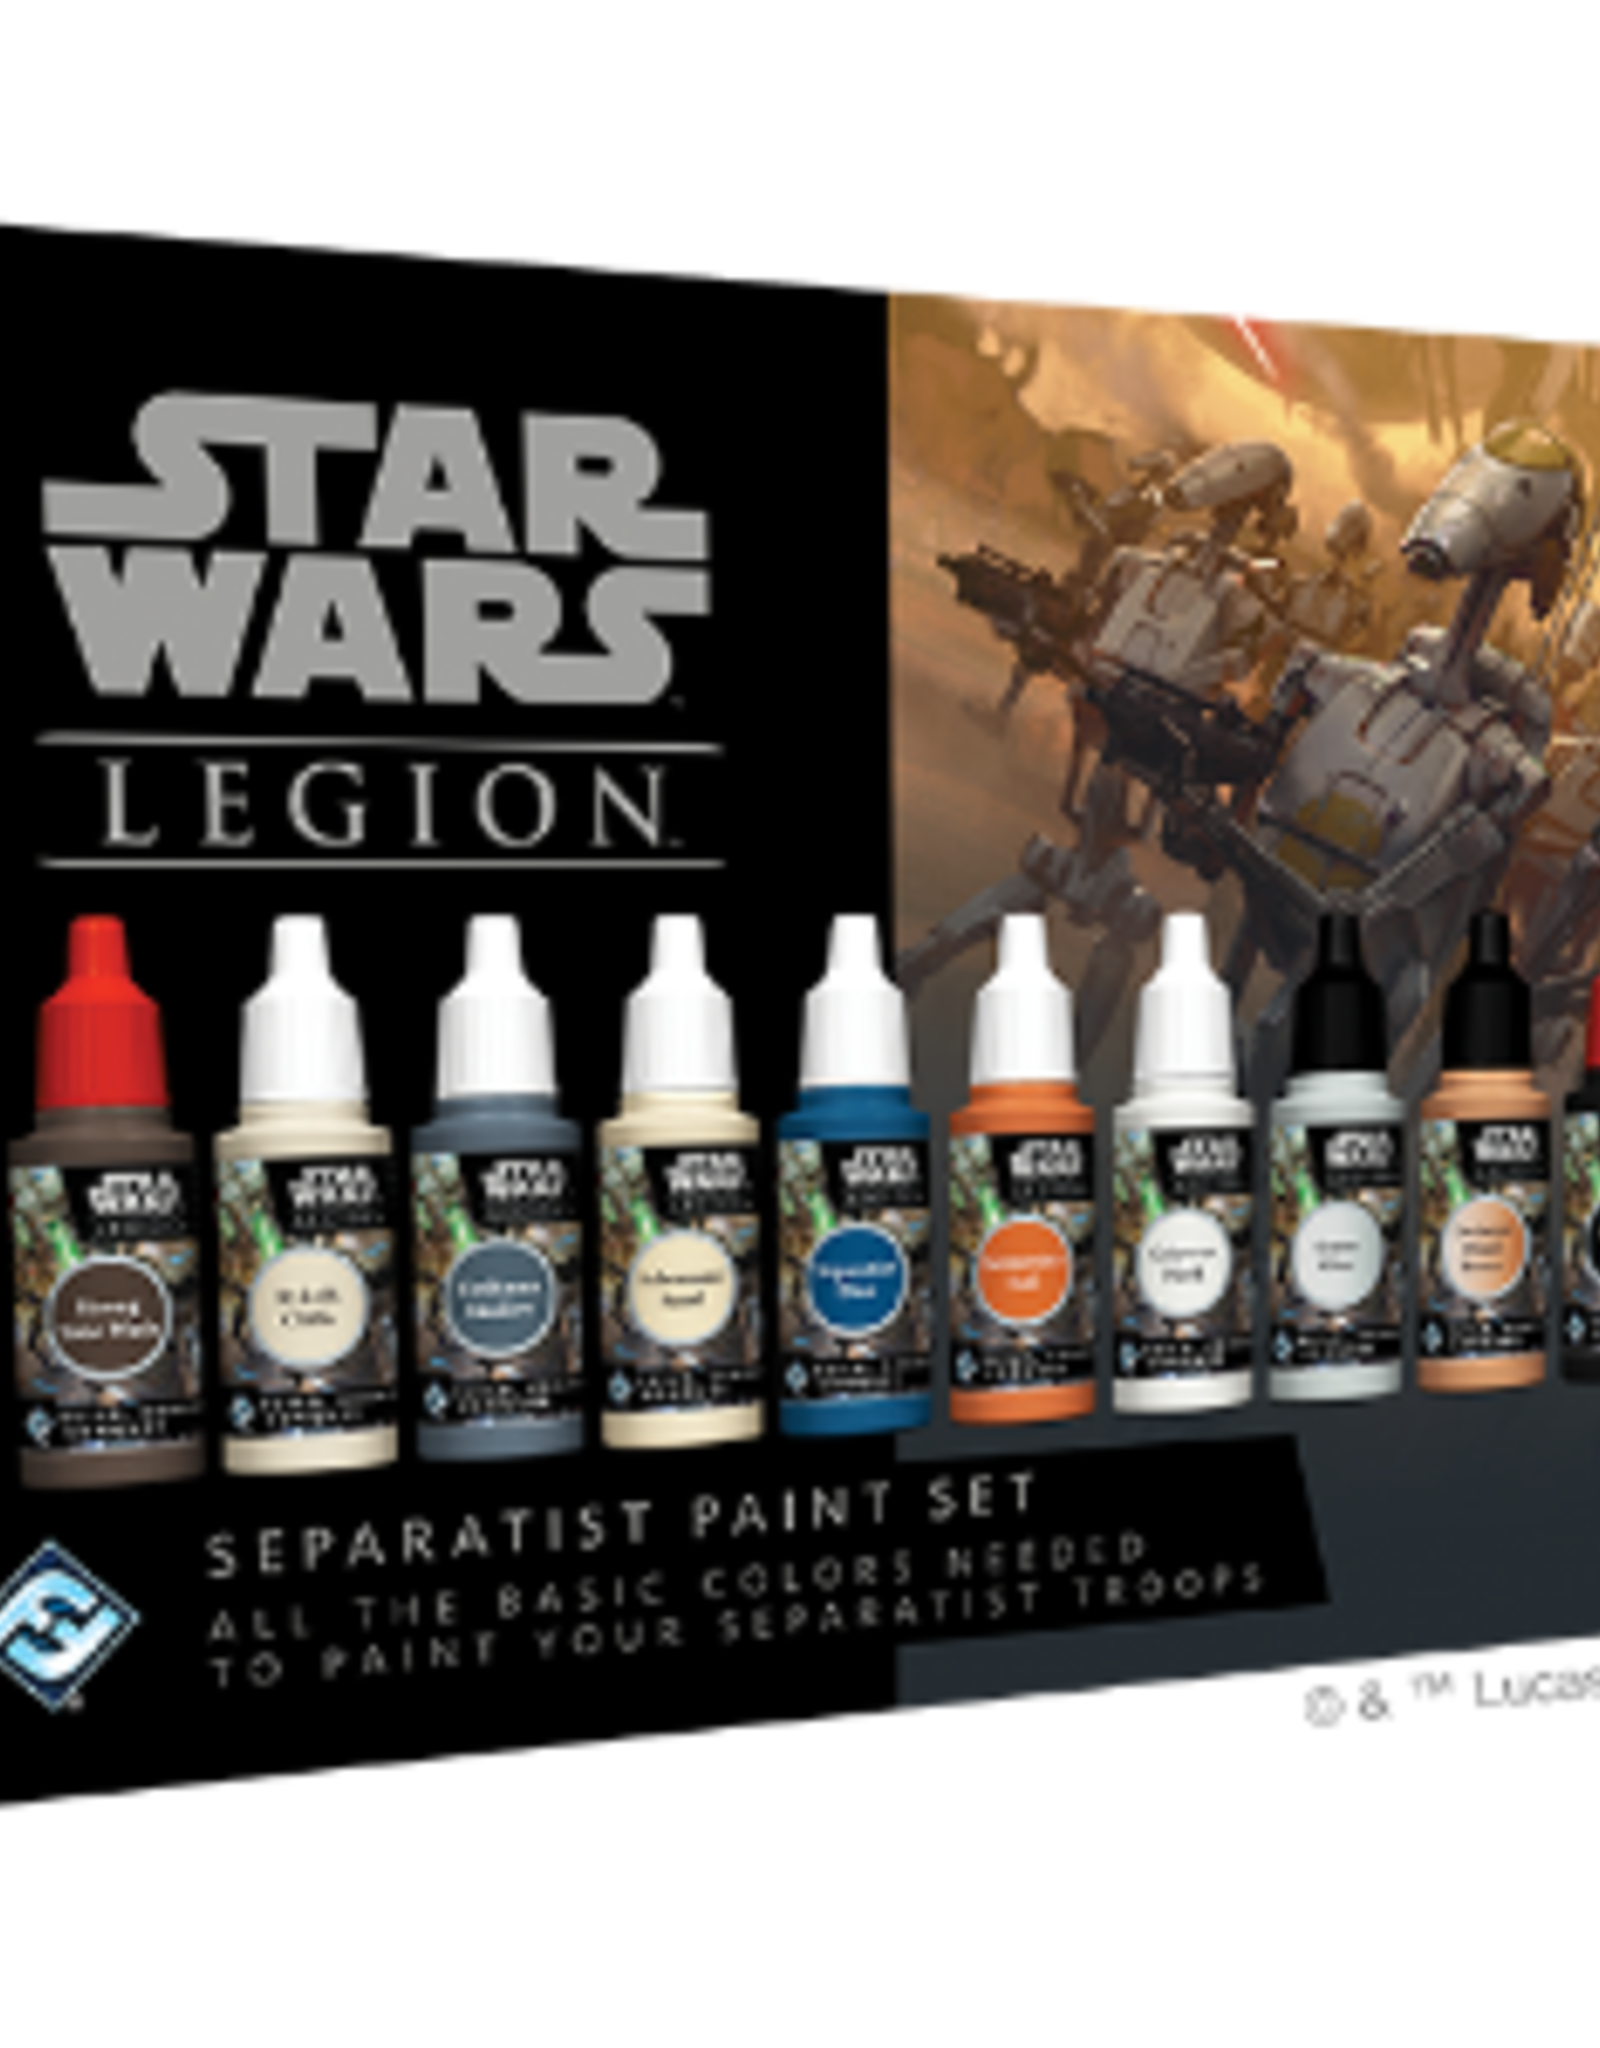 Seperatist Paint Set